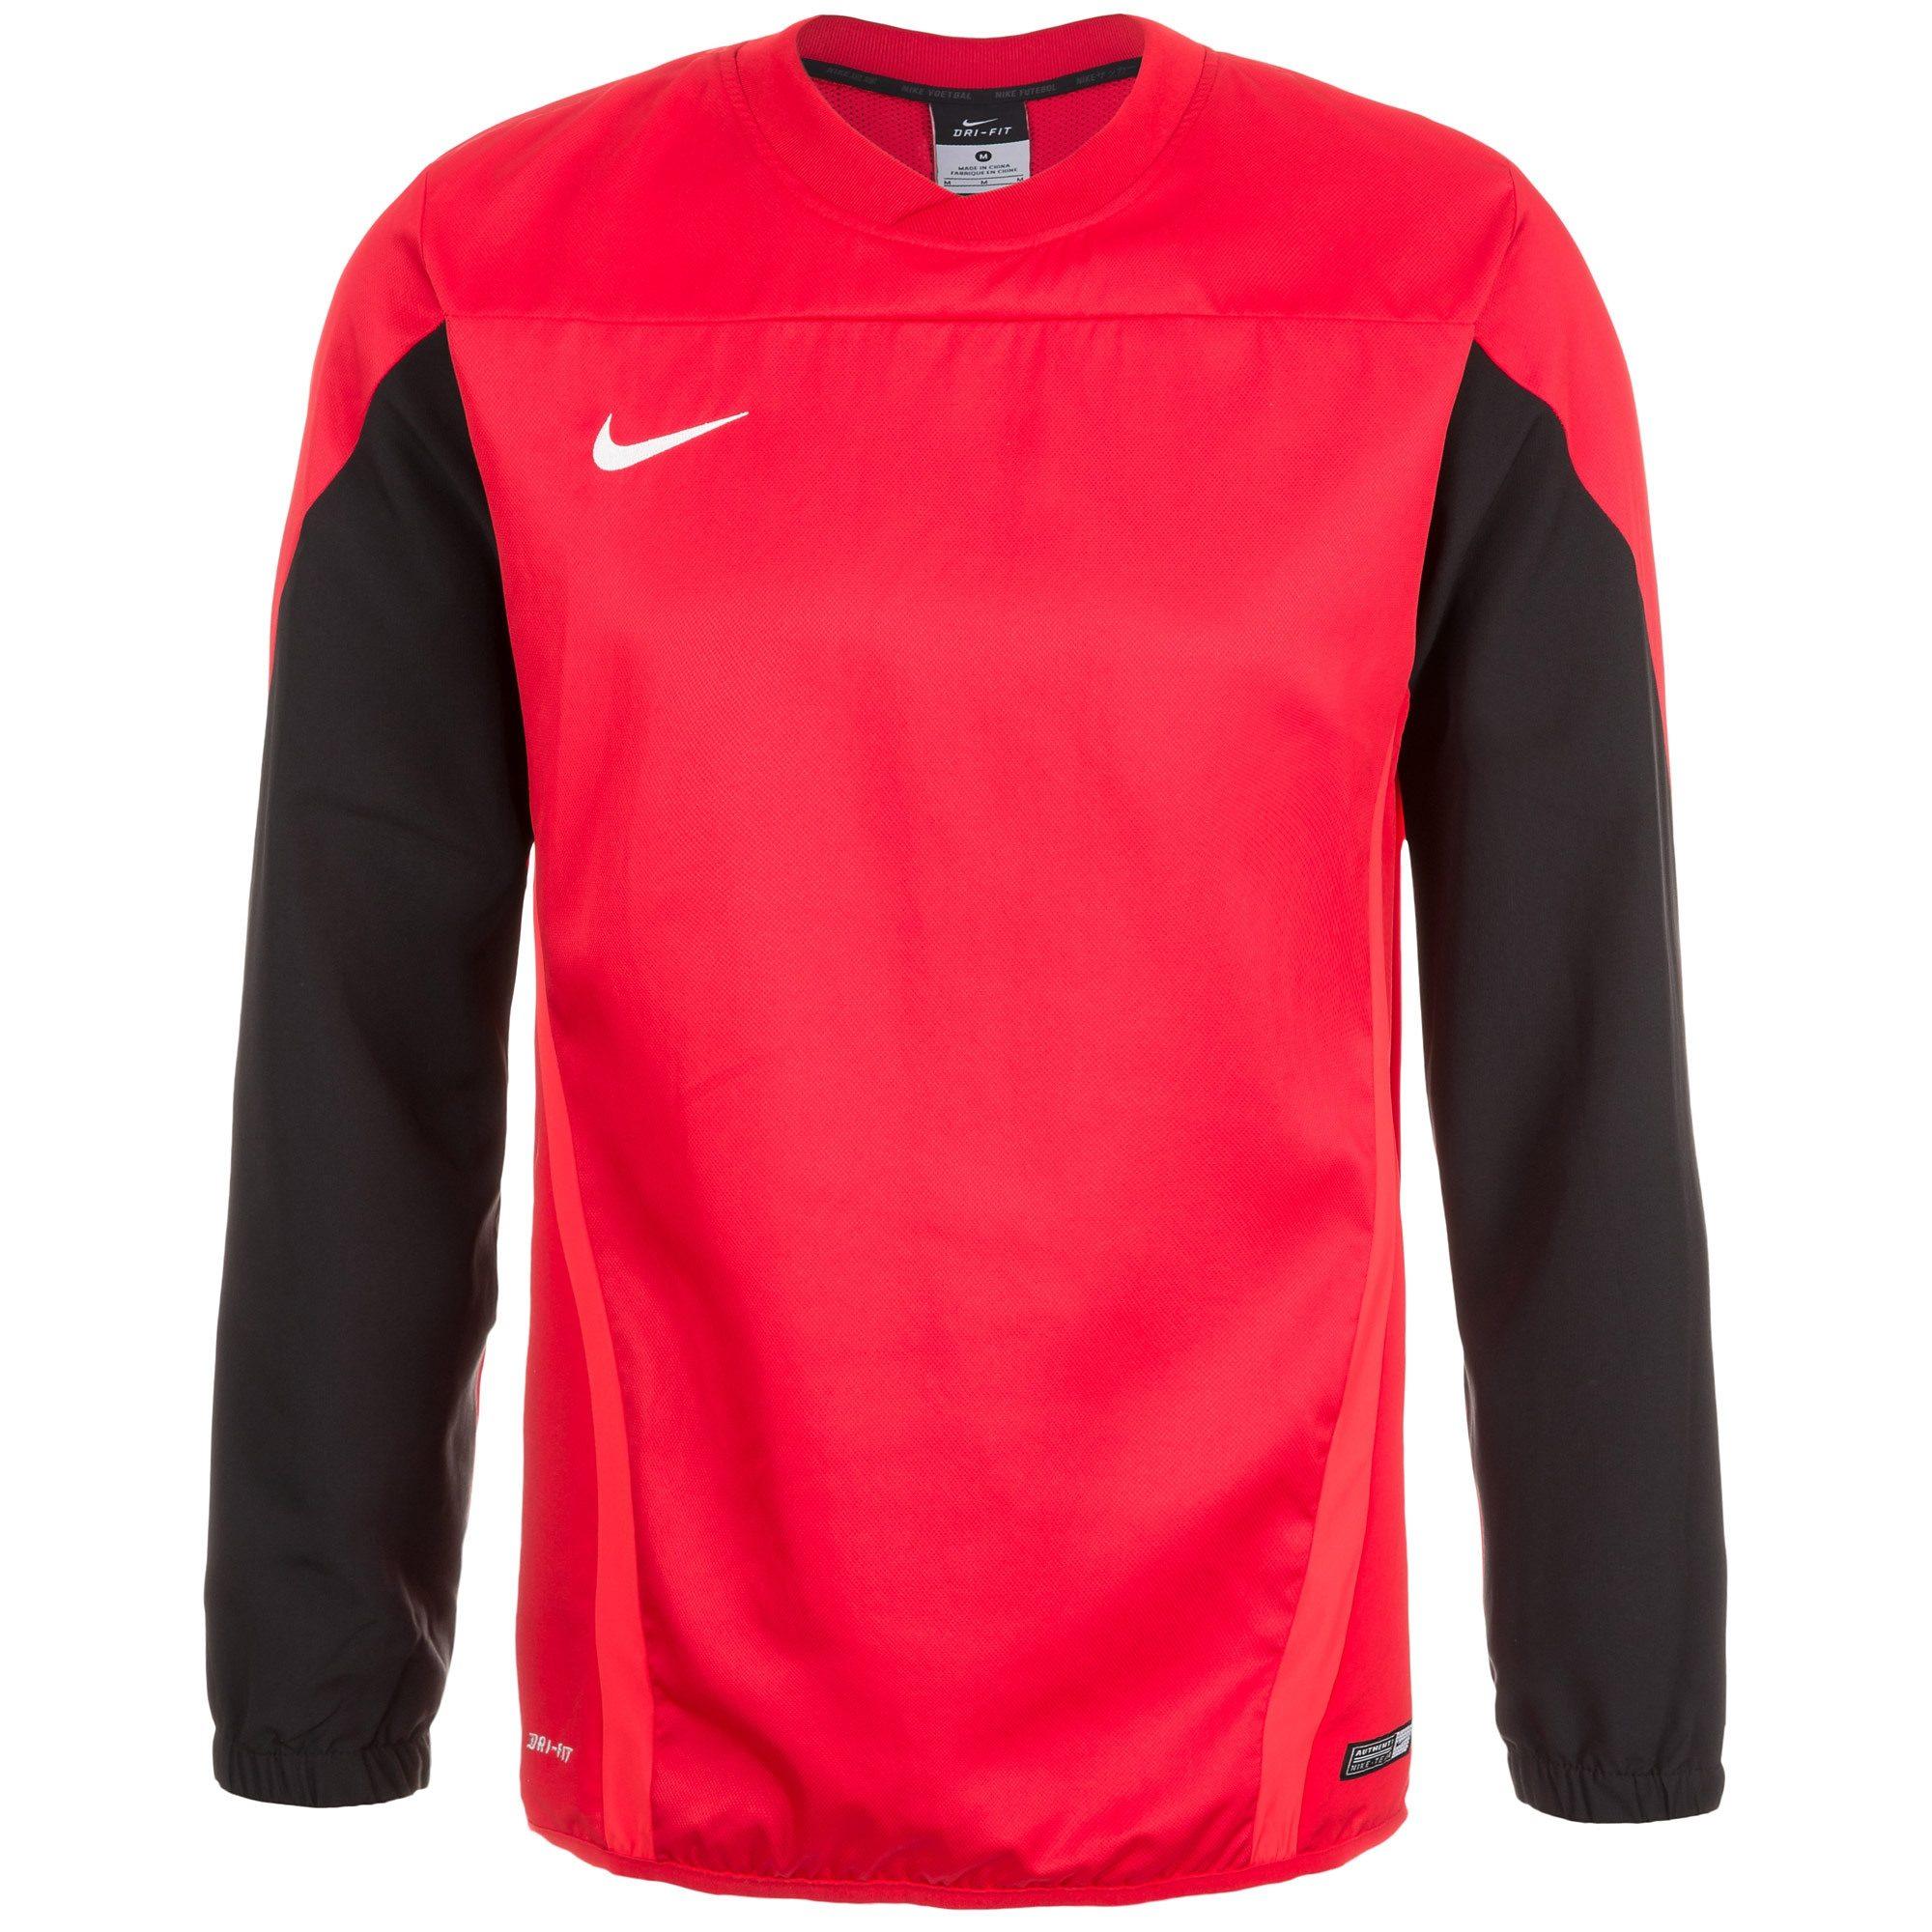 Nike Shell Trainingsshirt Herren | Sportbekleidung > Sportshirts | Rot | Ab - Polyester | Nike